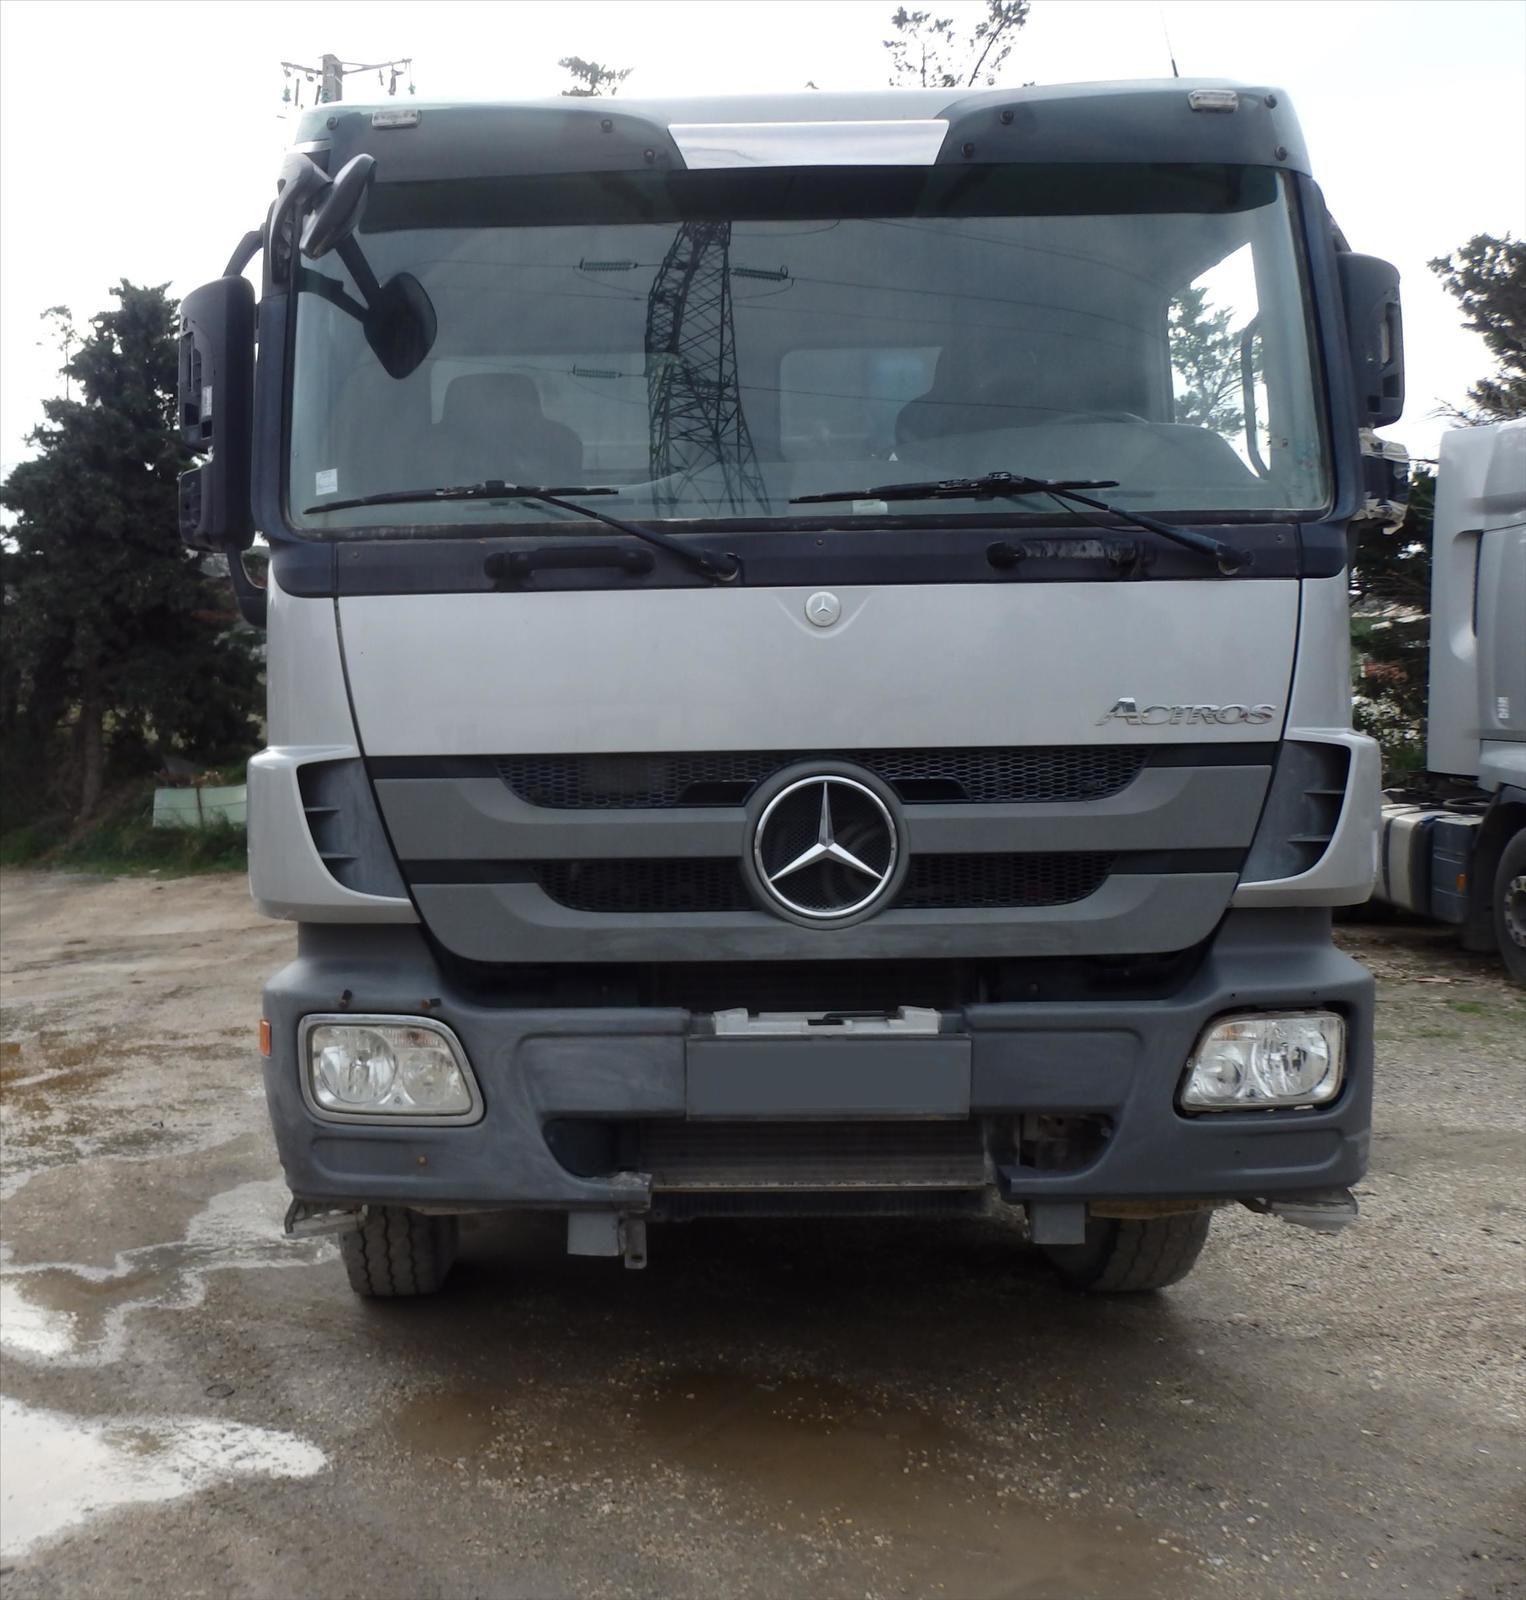 Camion Mercedes Actros 3241 8x4, BenneTel: 0608066192 Pierre BASSAT TRANSCOMM13